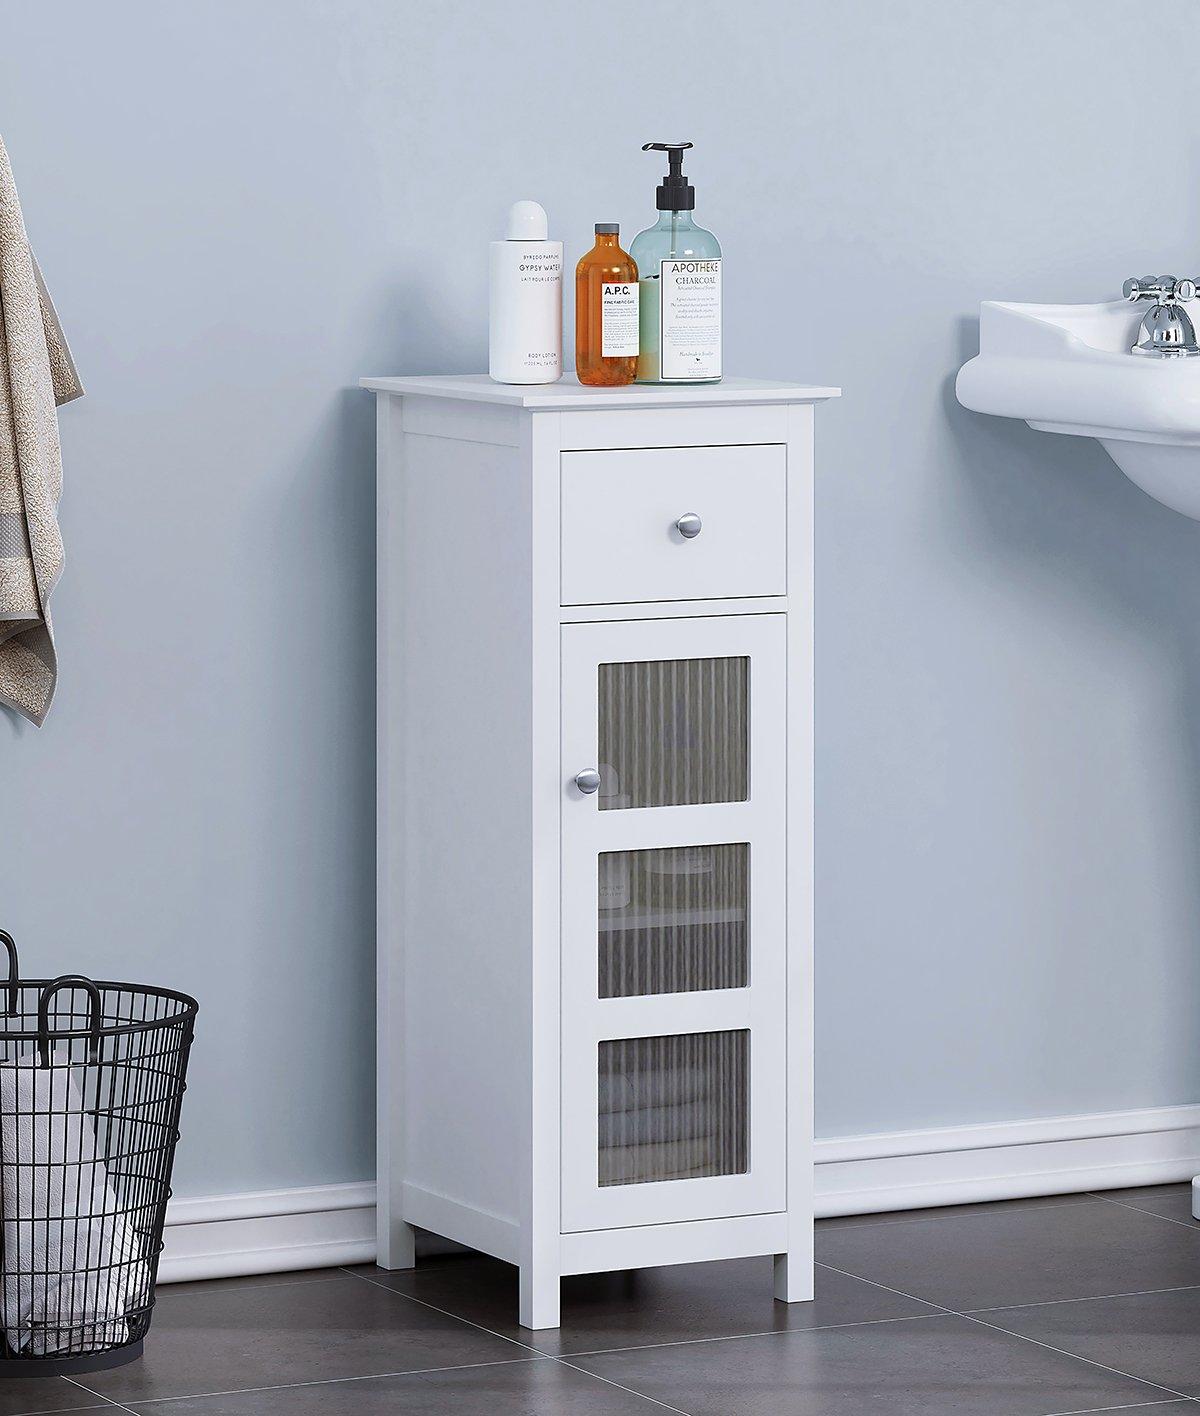 SPIRICH Bathroom Storage Floor Cabinet, Bathroom Cabinet free standing with Single Drawer and Adjustable Shelf,White